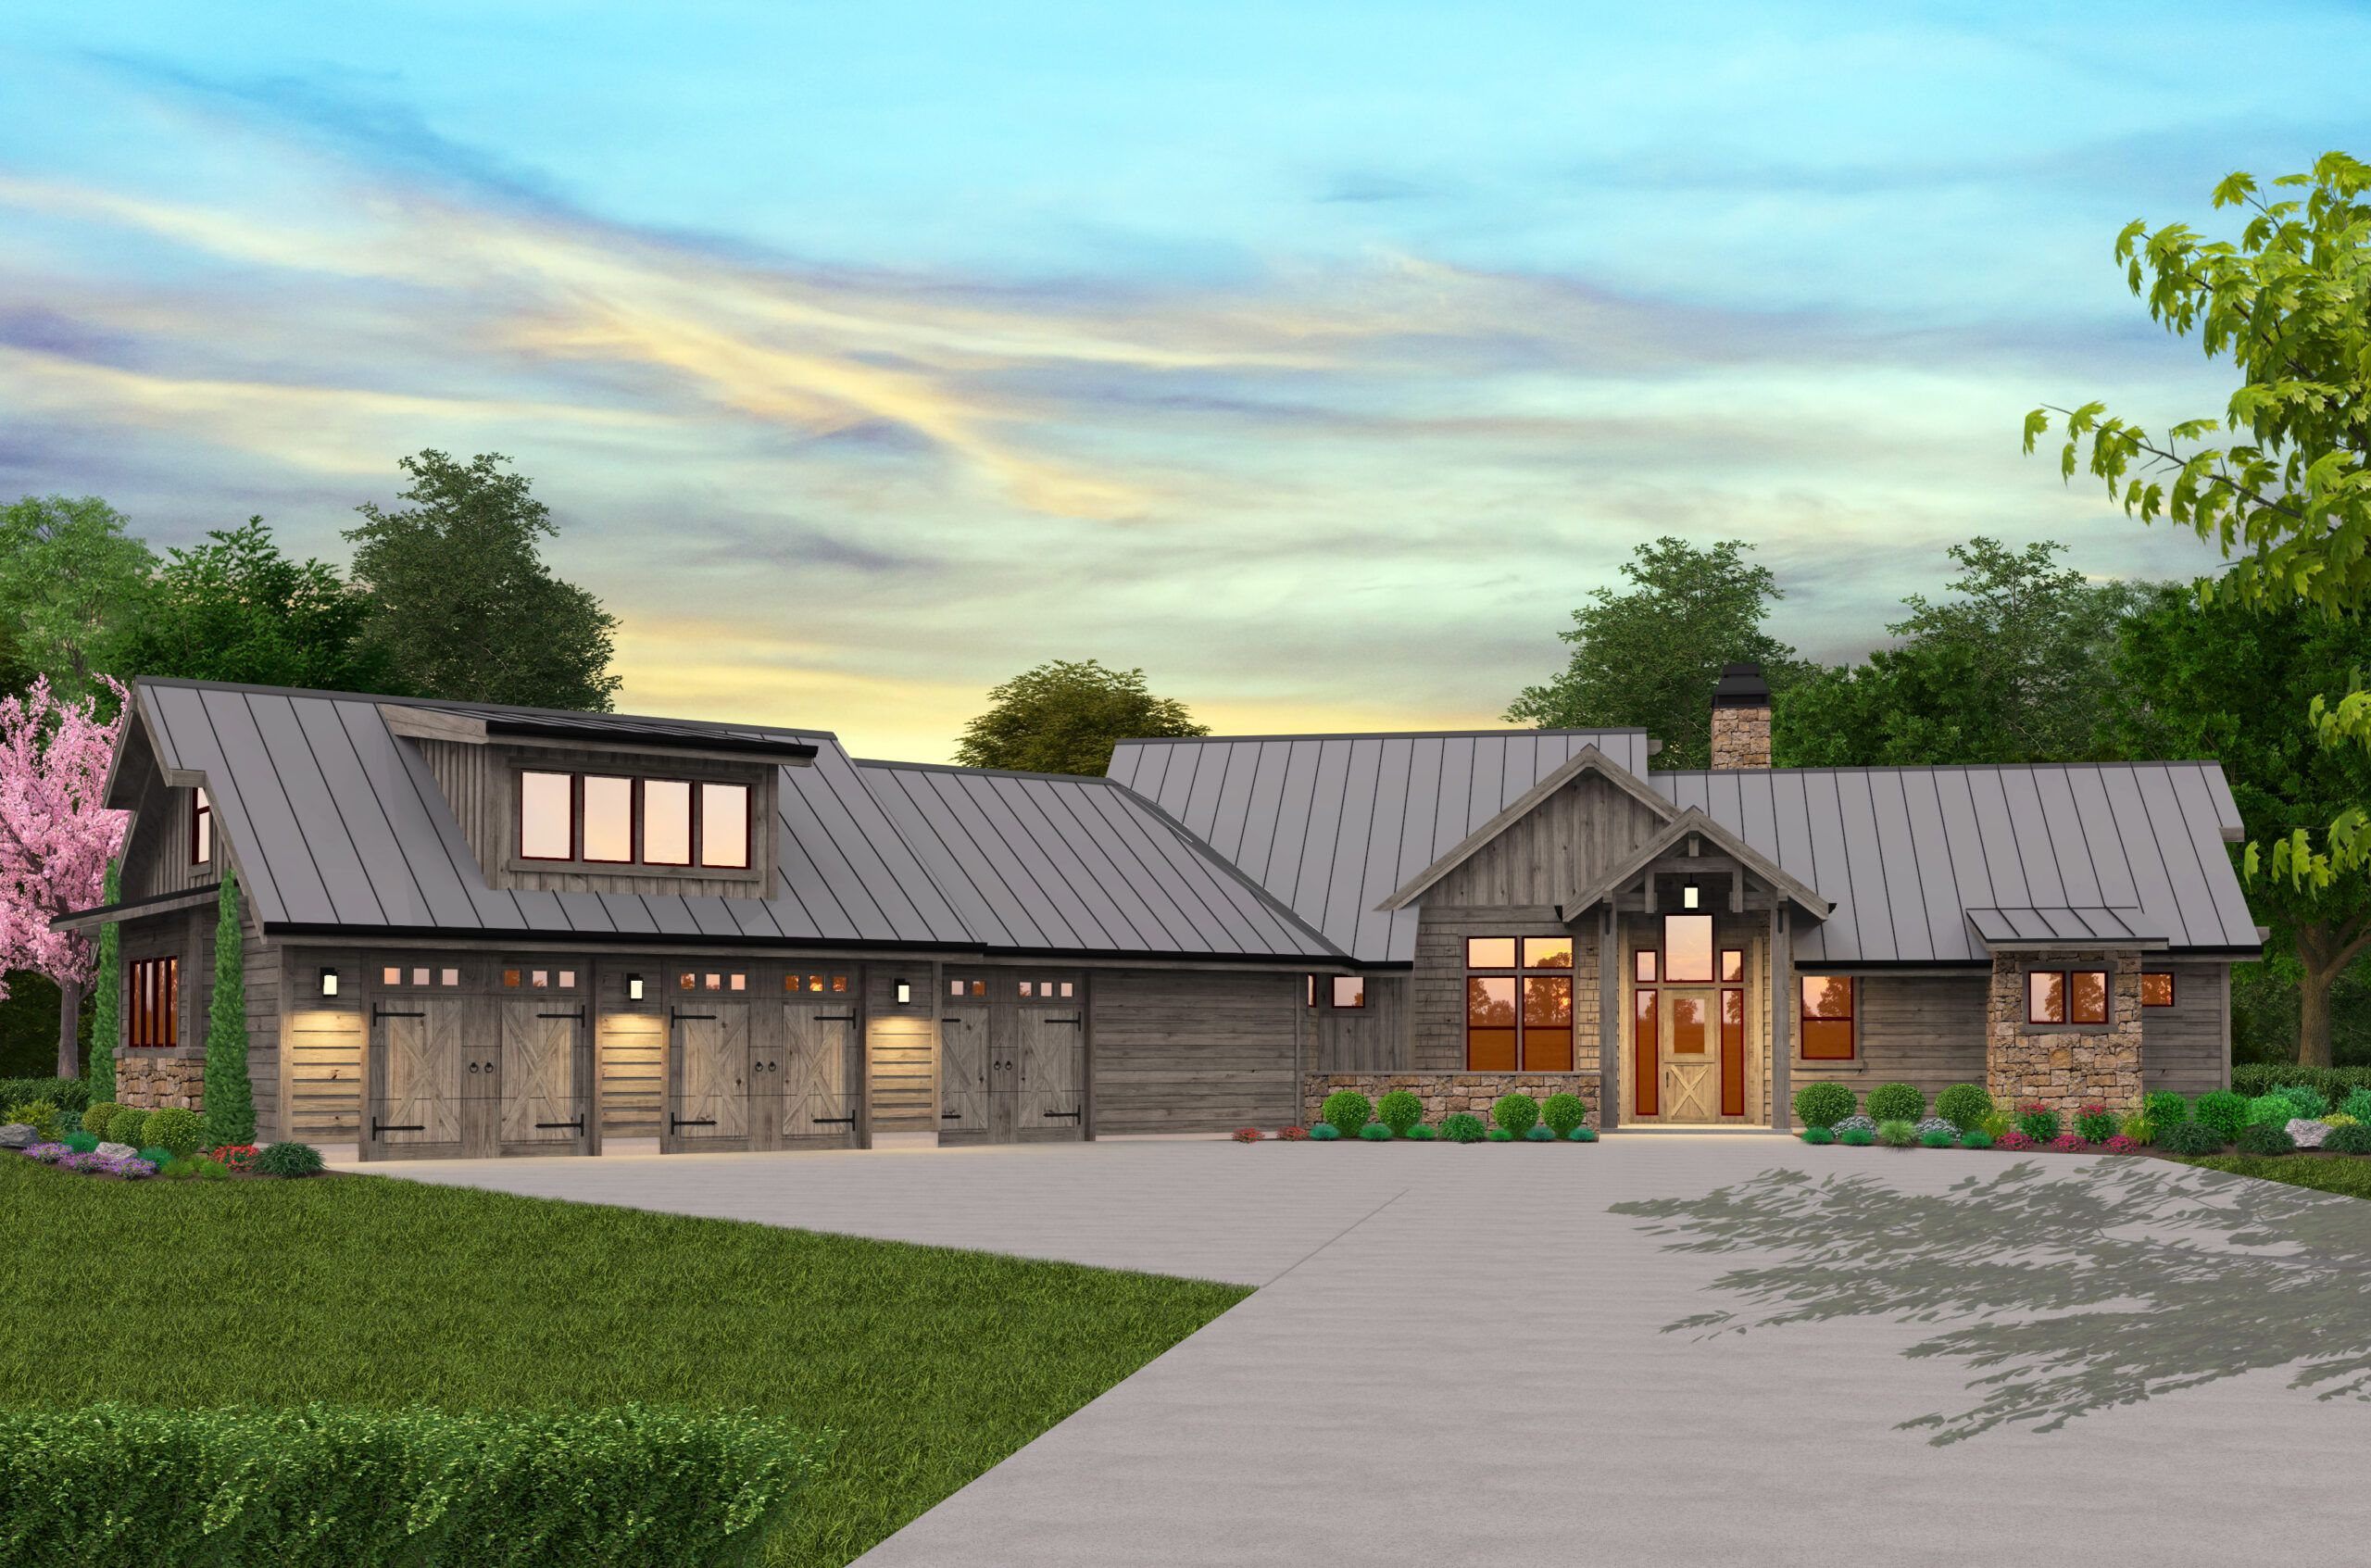 Adirondack Lodge House Plan Modern Lodge Home Design Floor Plan Porch House Plans French Country House Plans Country House Plans